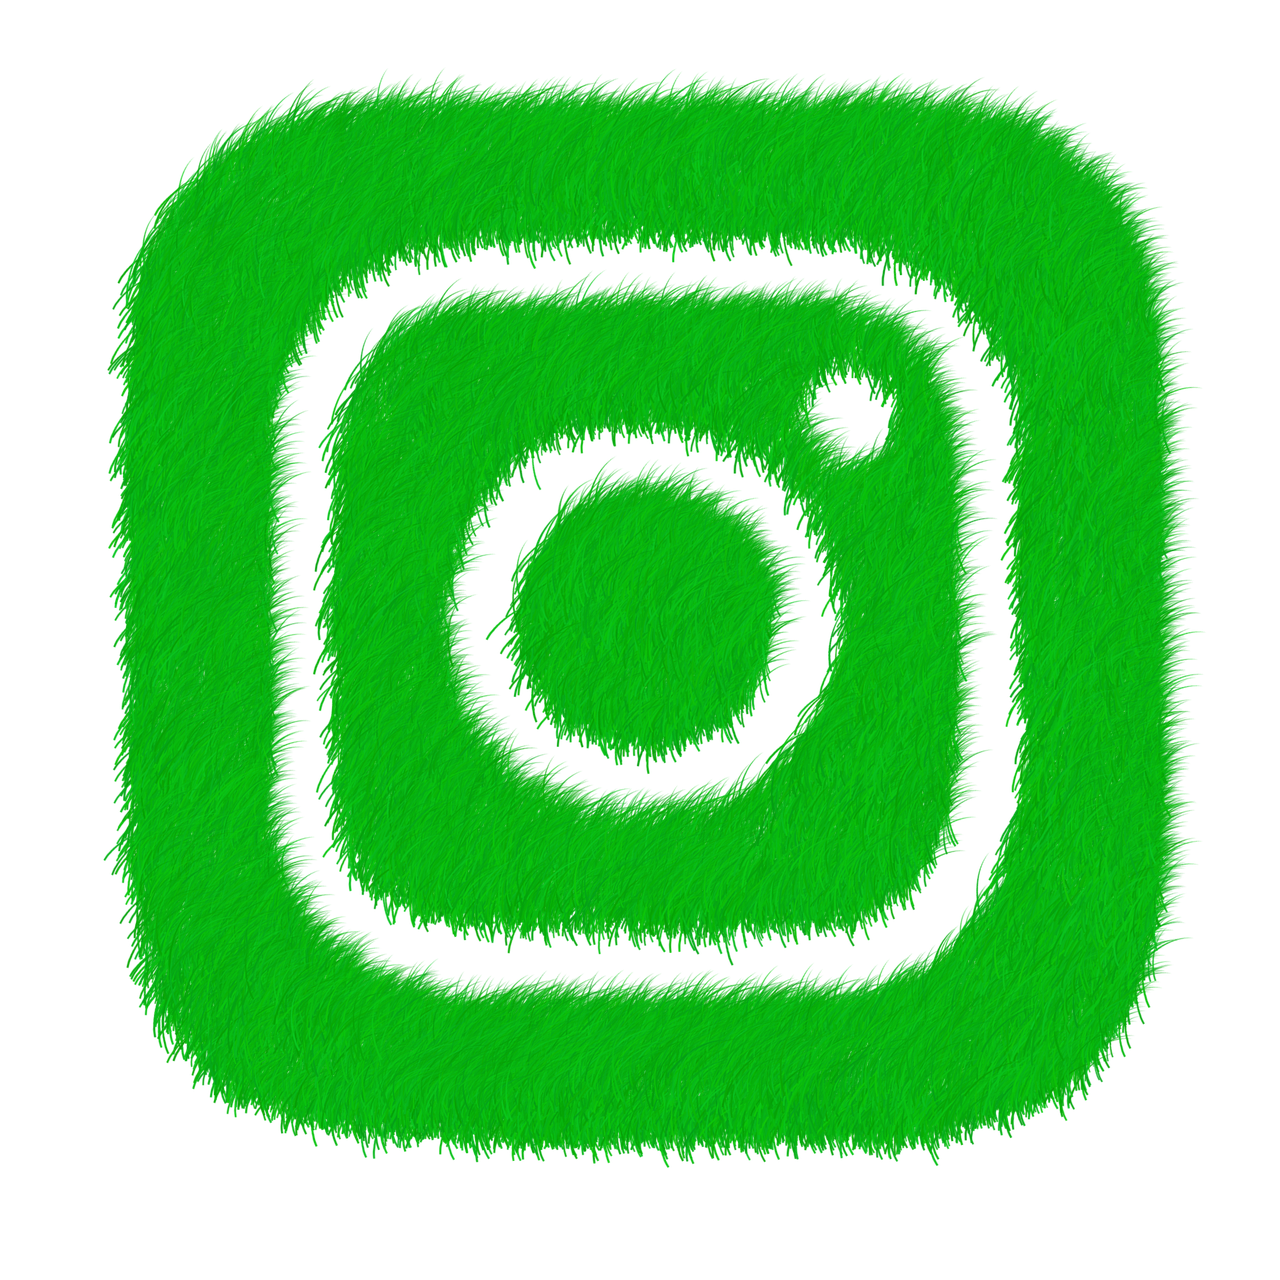 אייקון ירוק